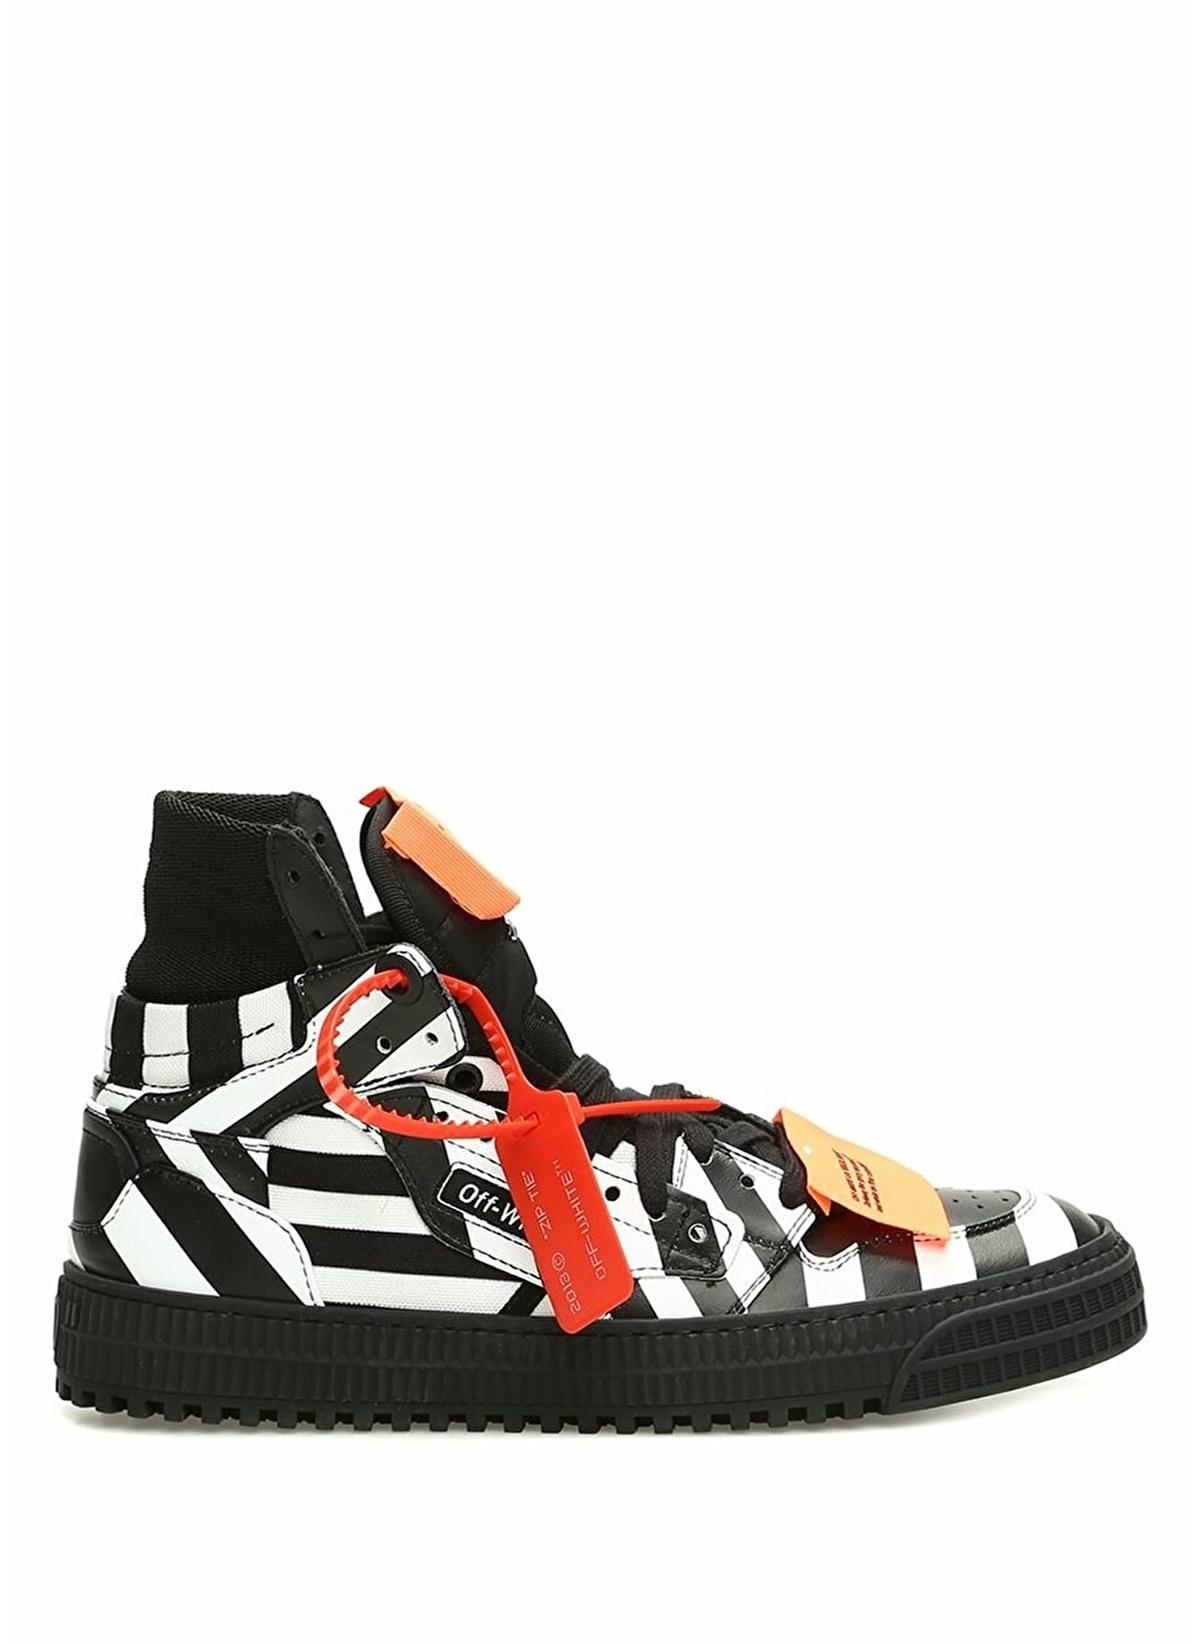 Off-white Sneakers 101380535 K Sneakers – 4749.0 TL